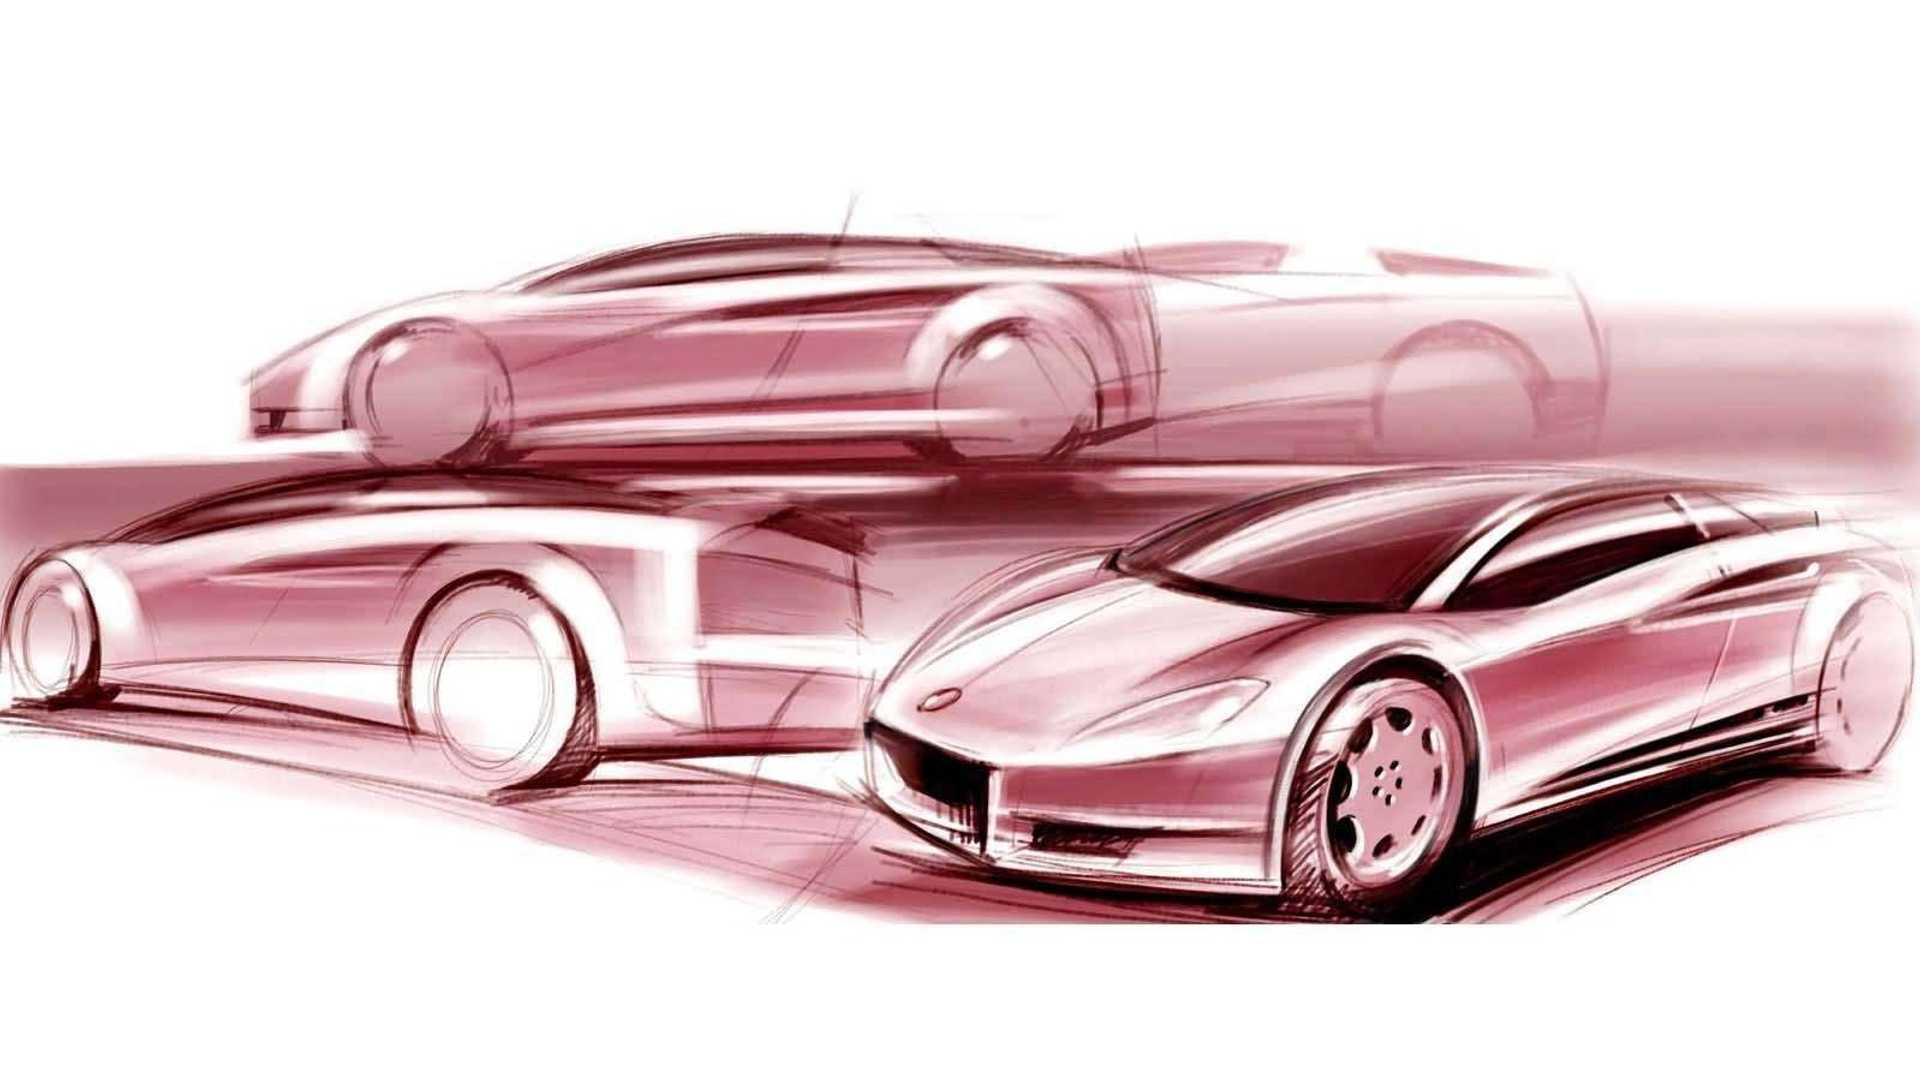 Toyota-Alessandro-Volta-concept-2004-24